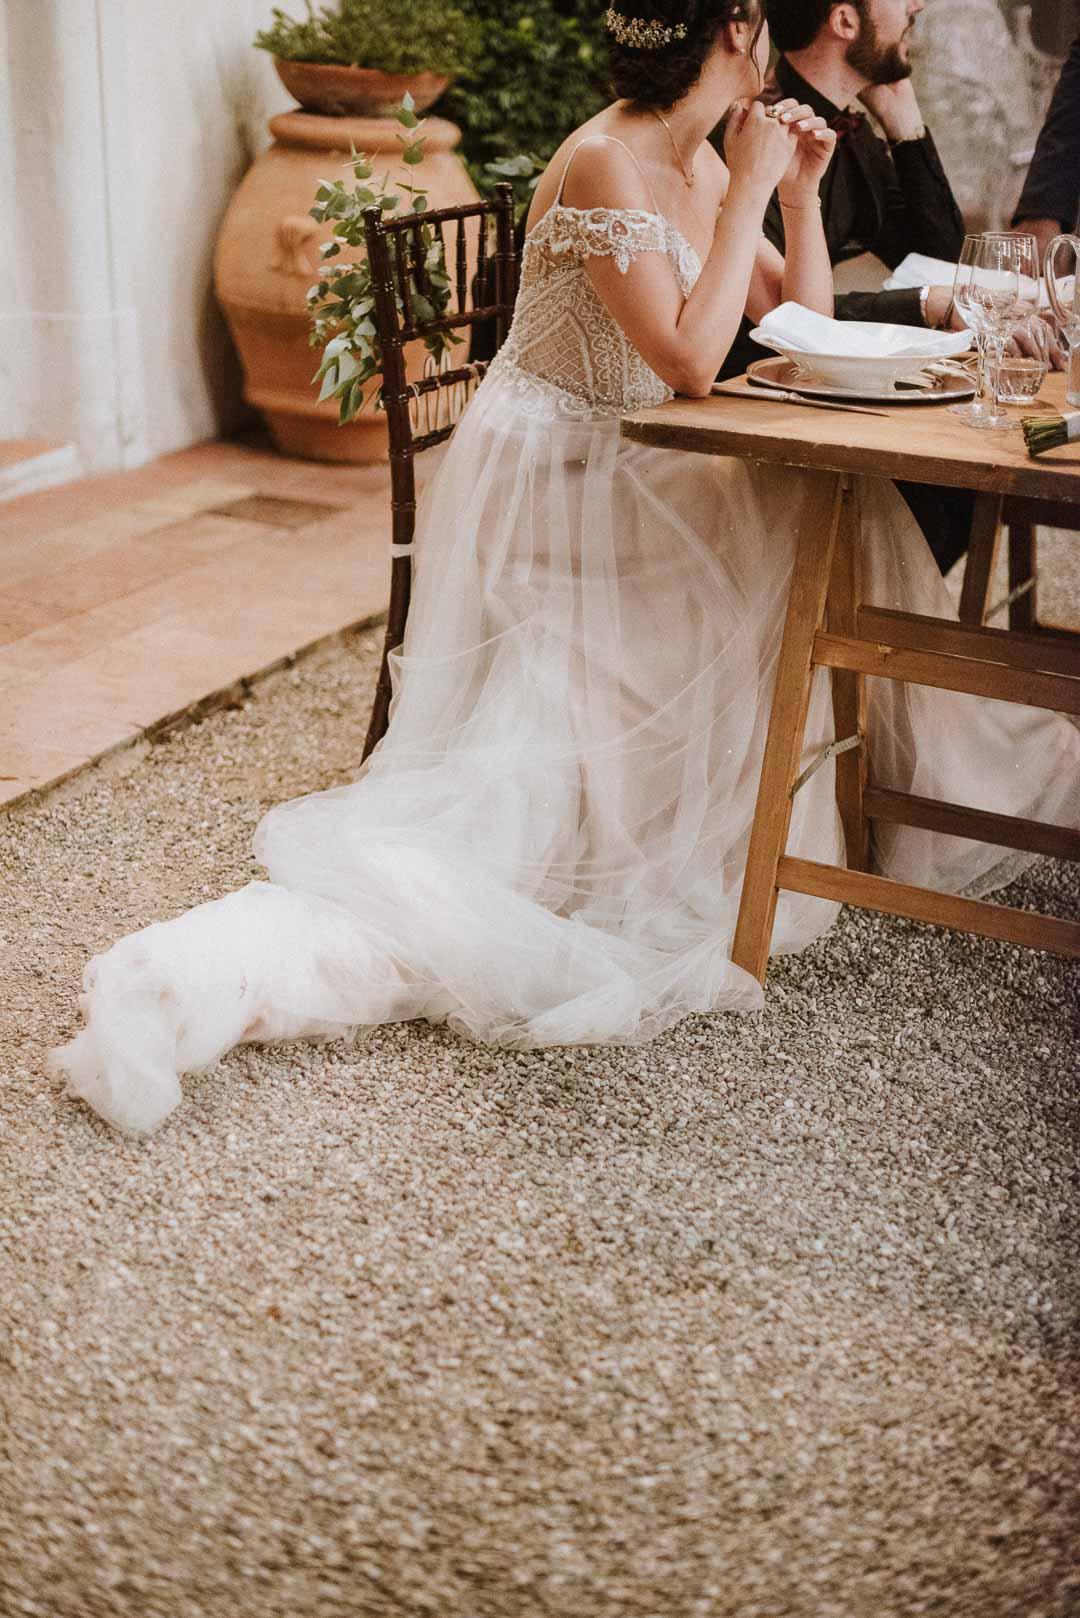 wedding-photographer-destination-fineart-bespoke-reportage-tuscany-villascorzi-vivianeizzo-spazio46-165